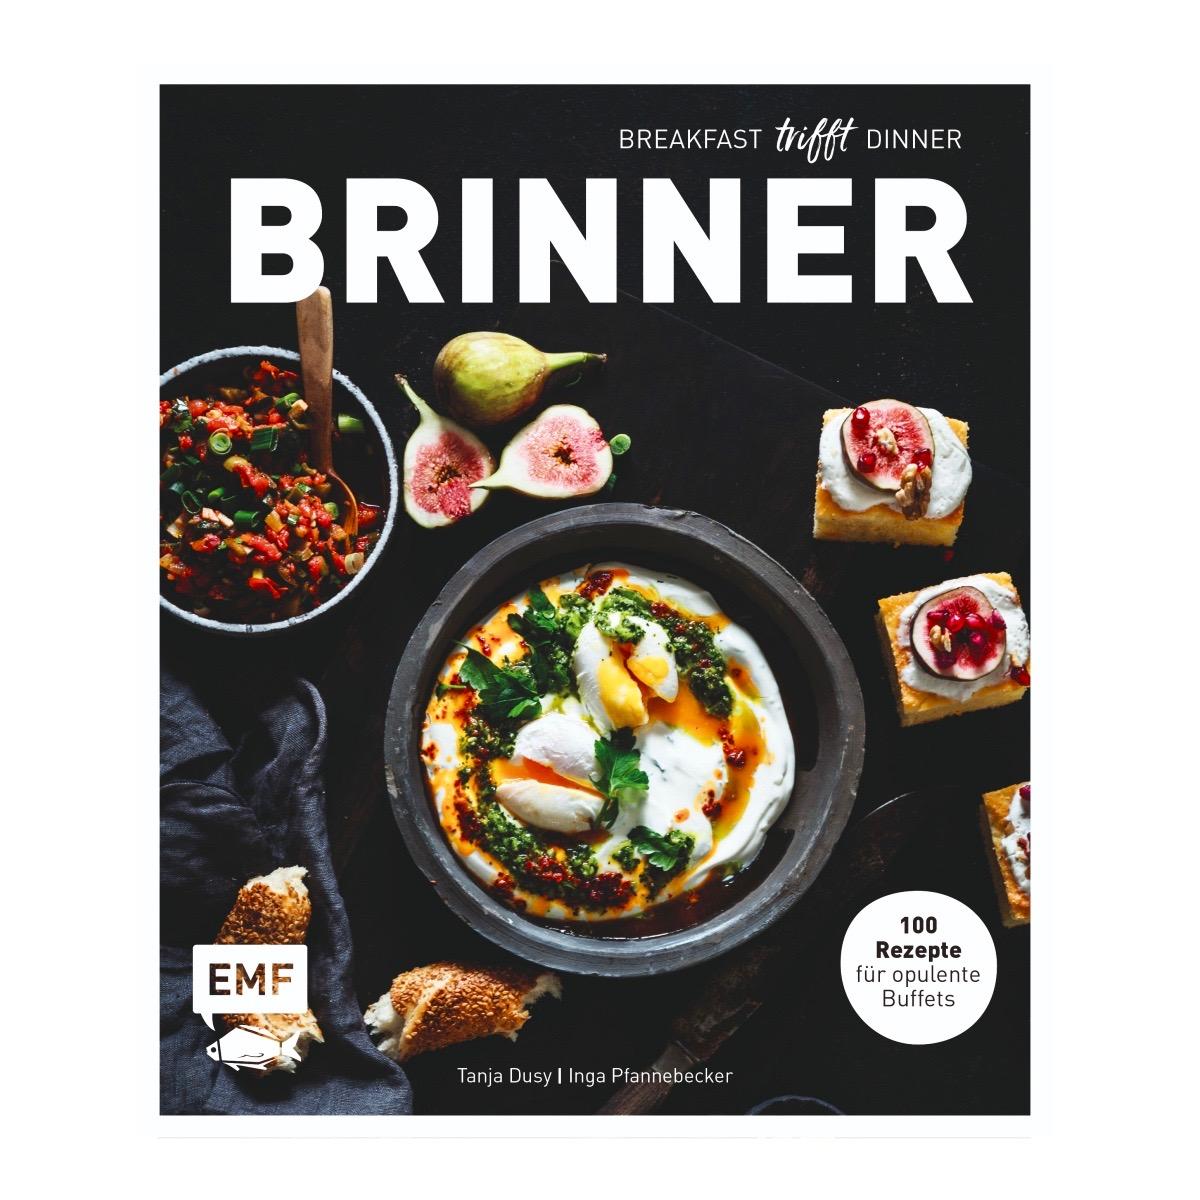 Brinner Kochbuch EMF